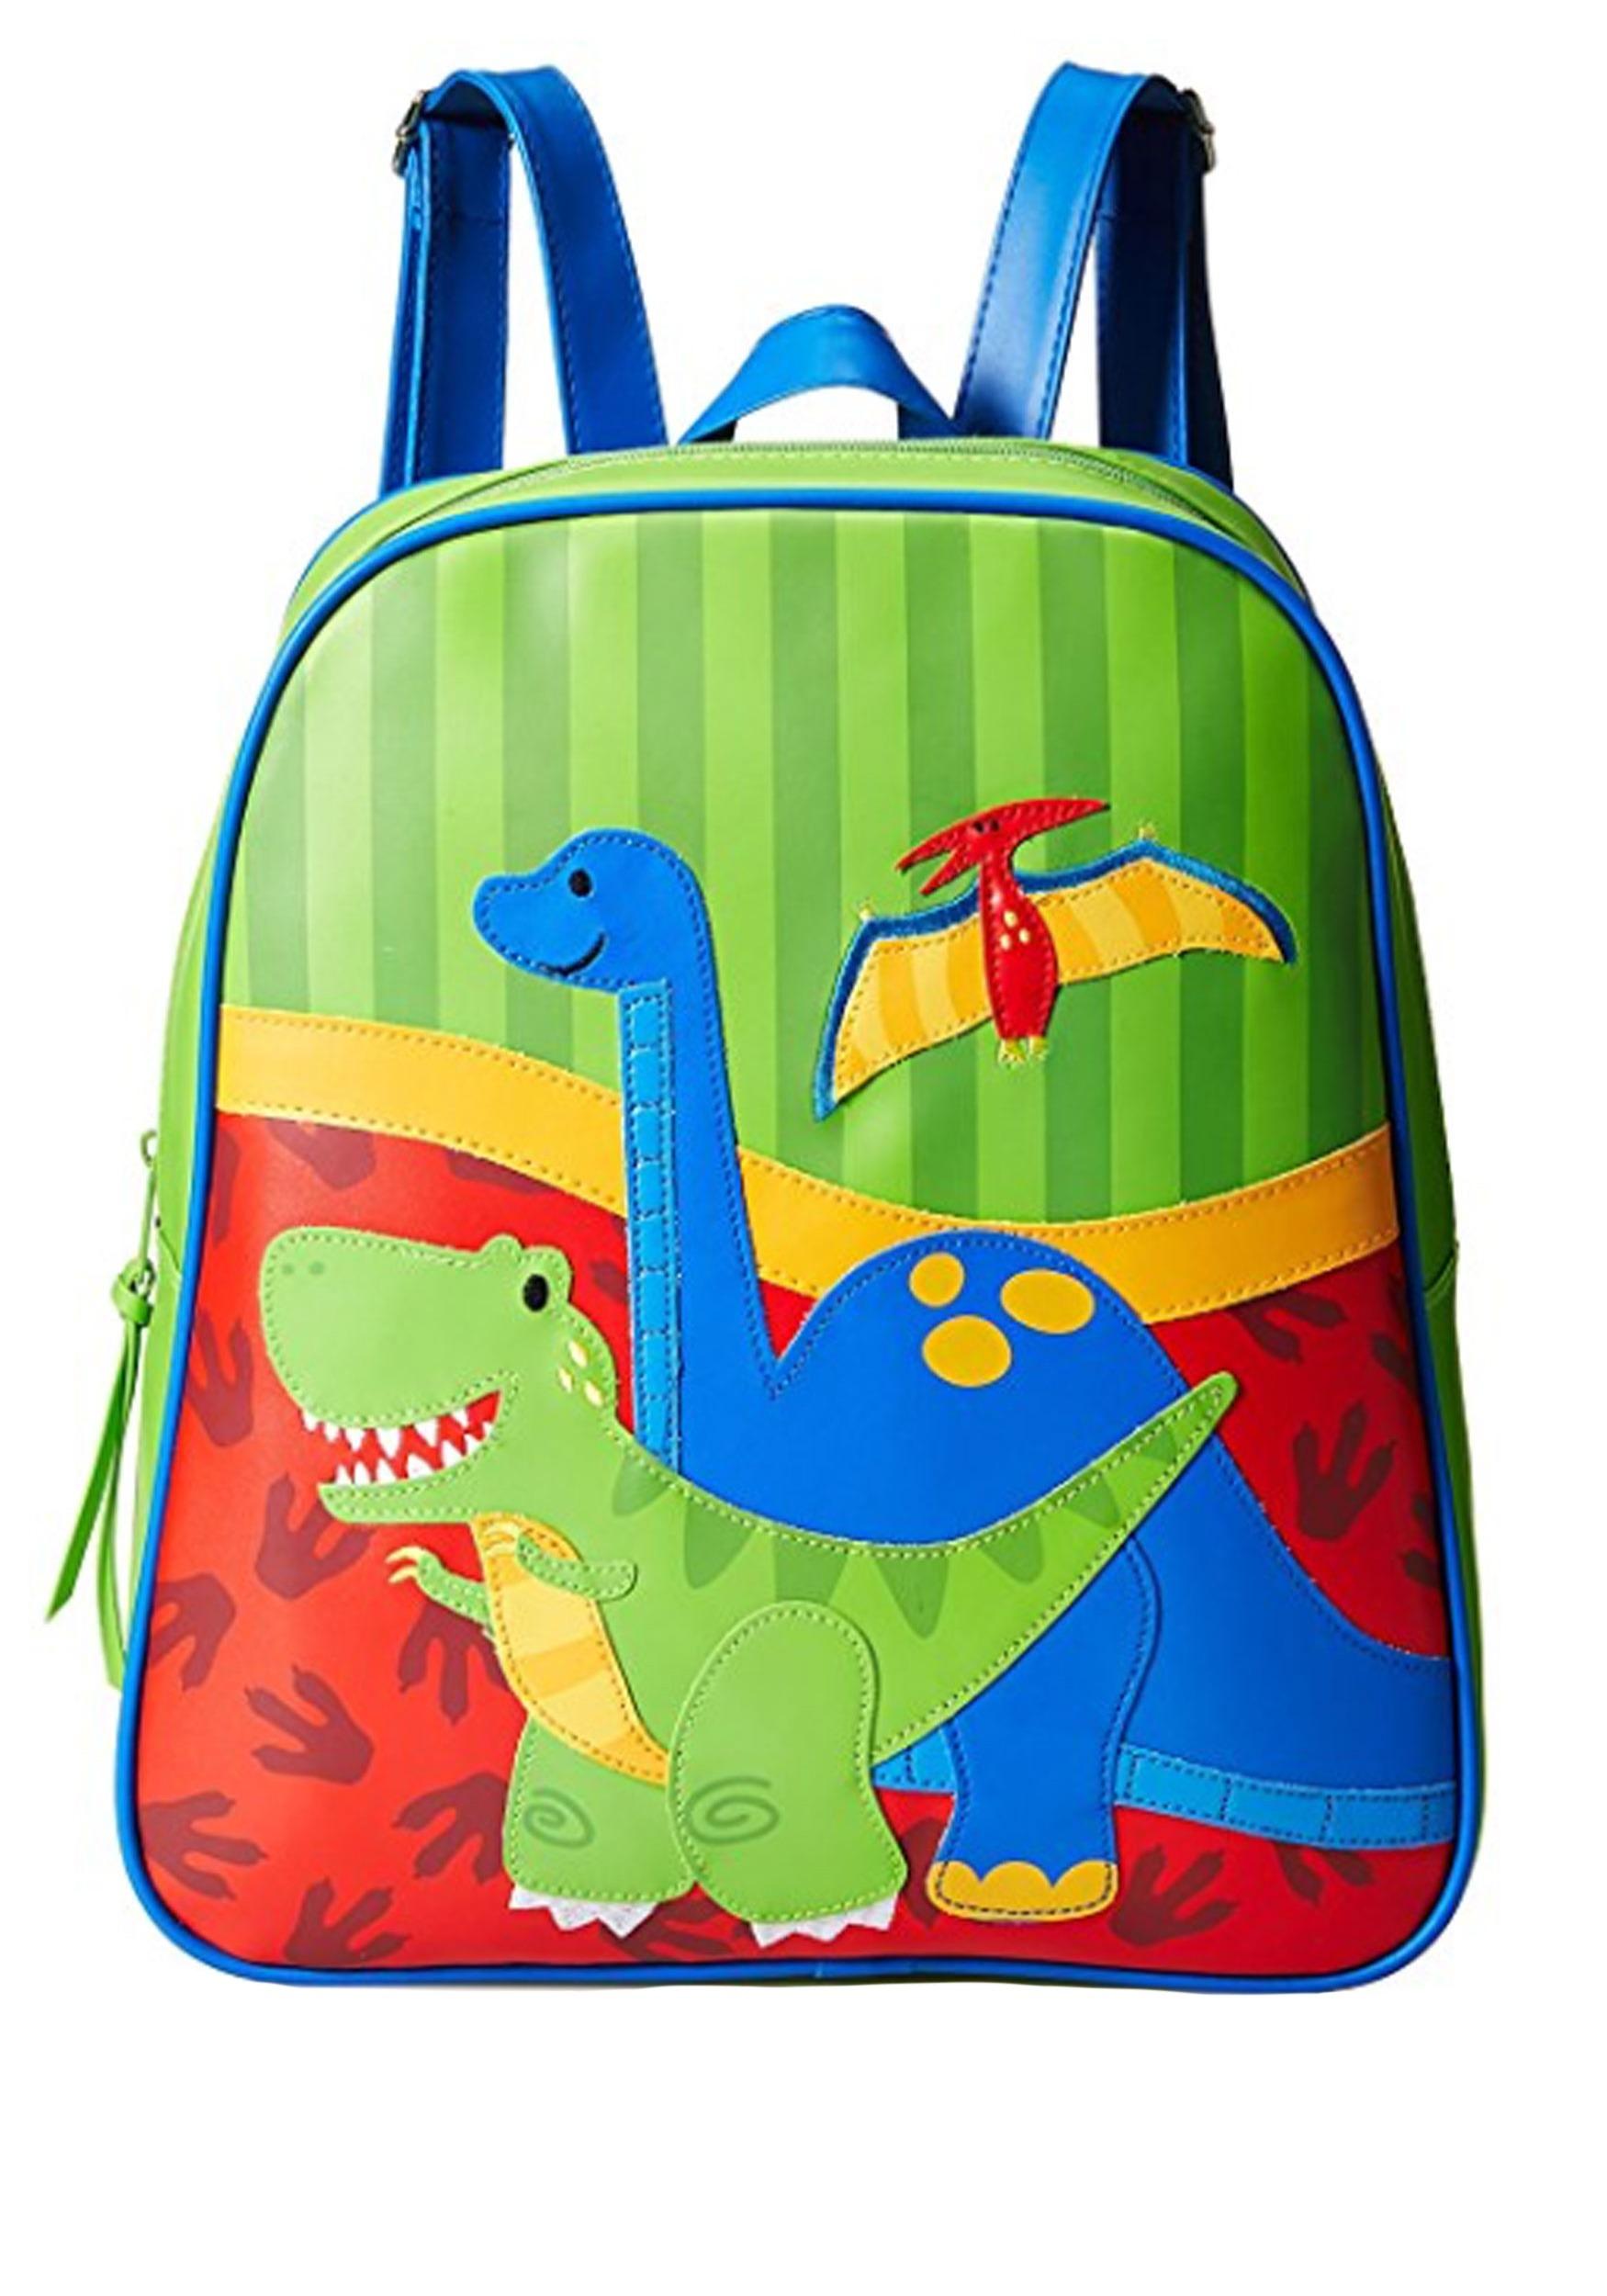 Dinosaur Stephen Joseph Go-Go Bag